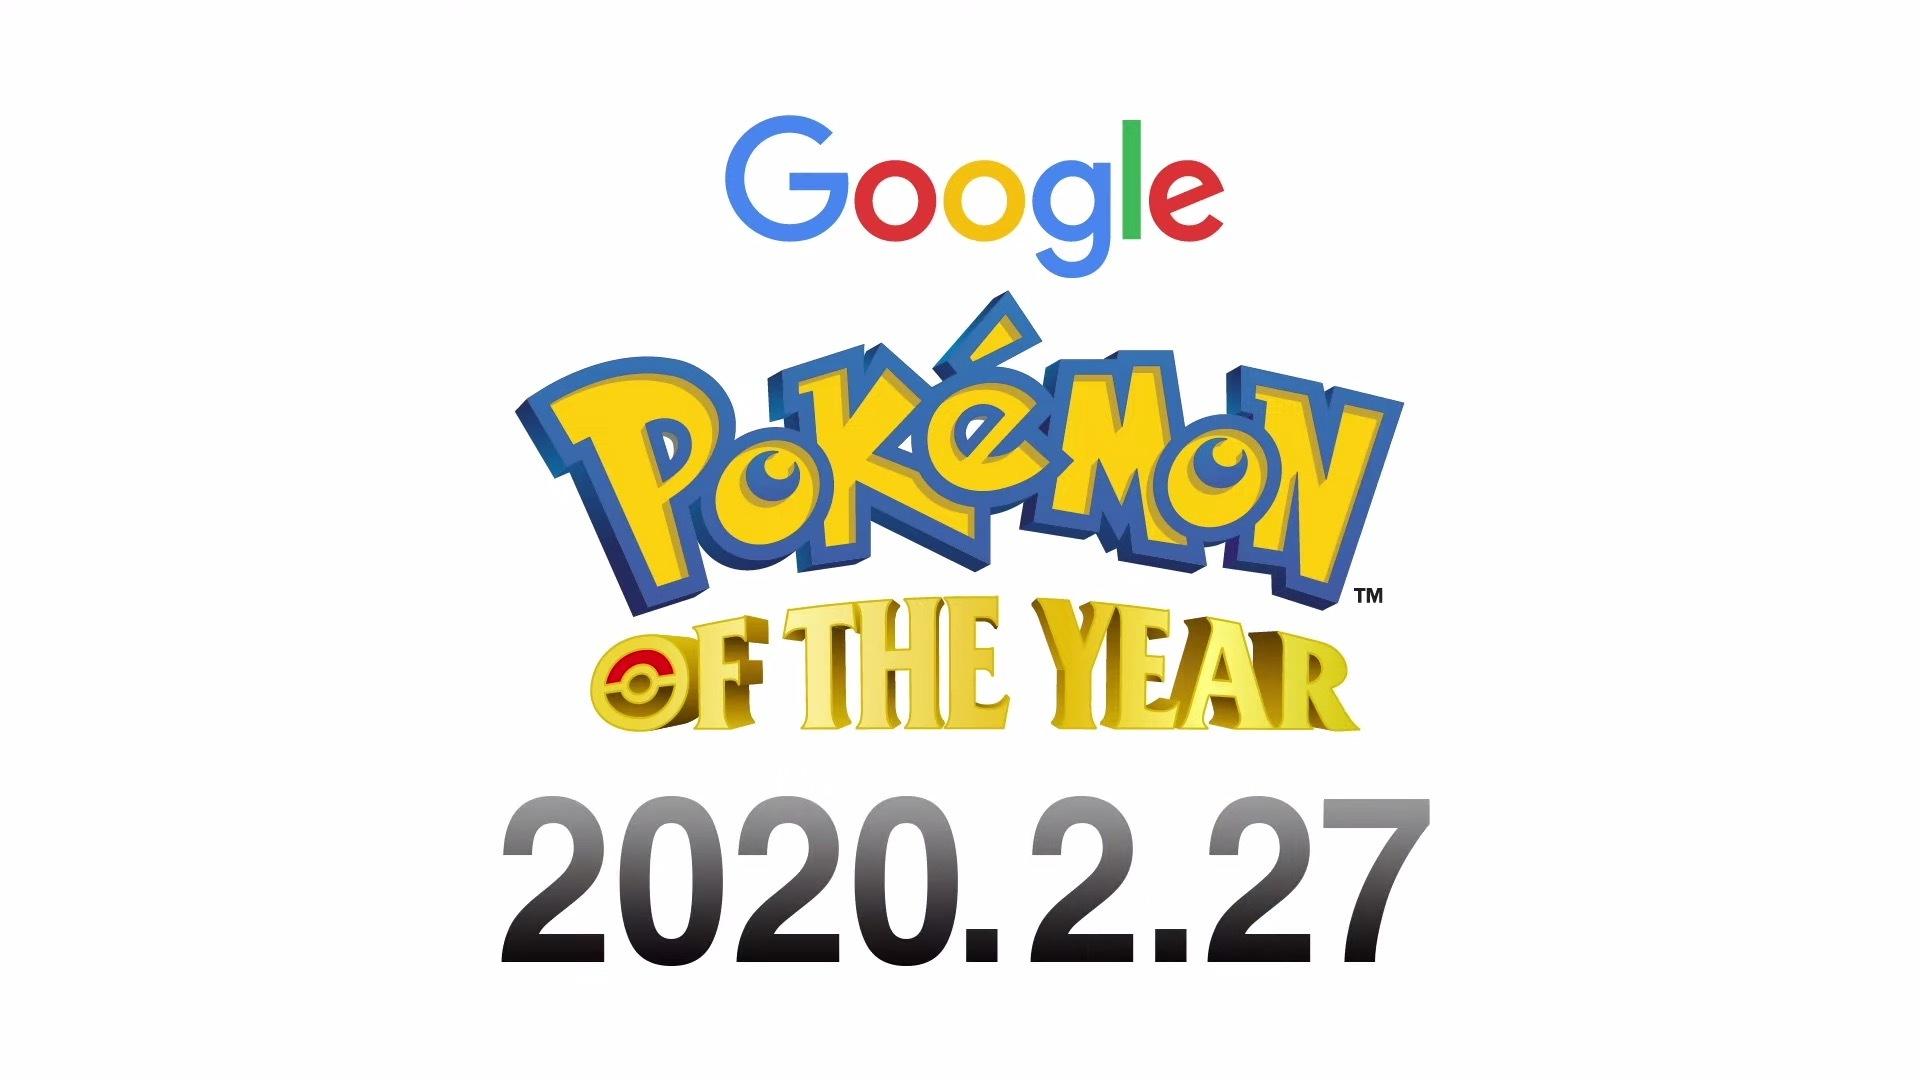 Pokemon 622020 2